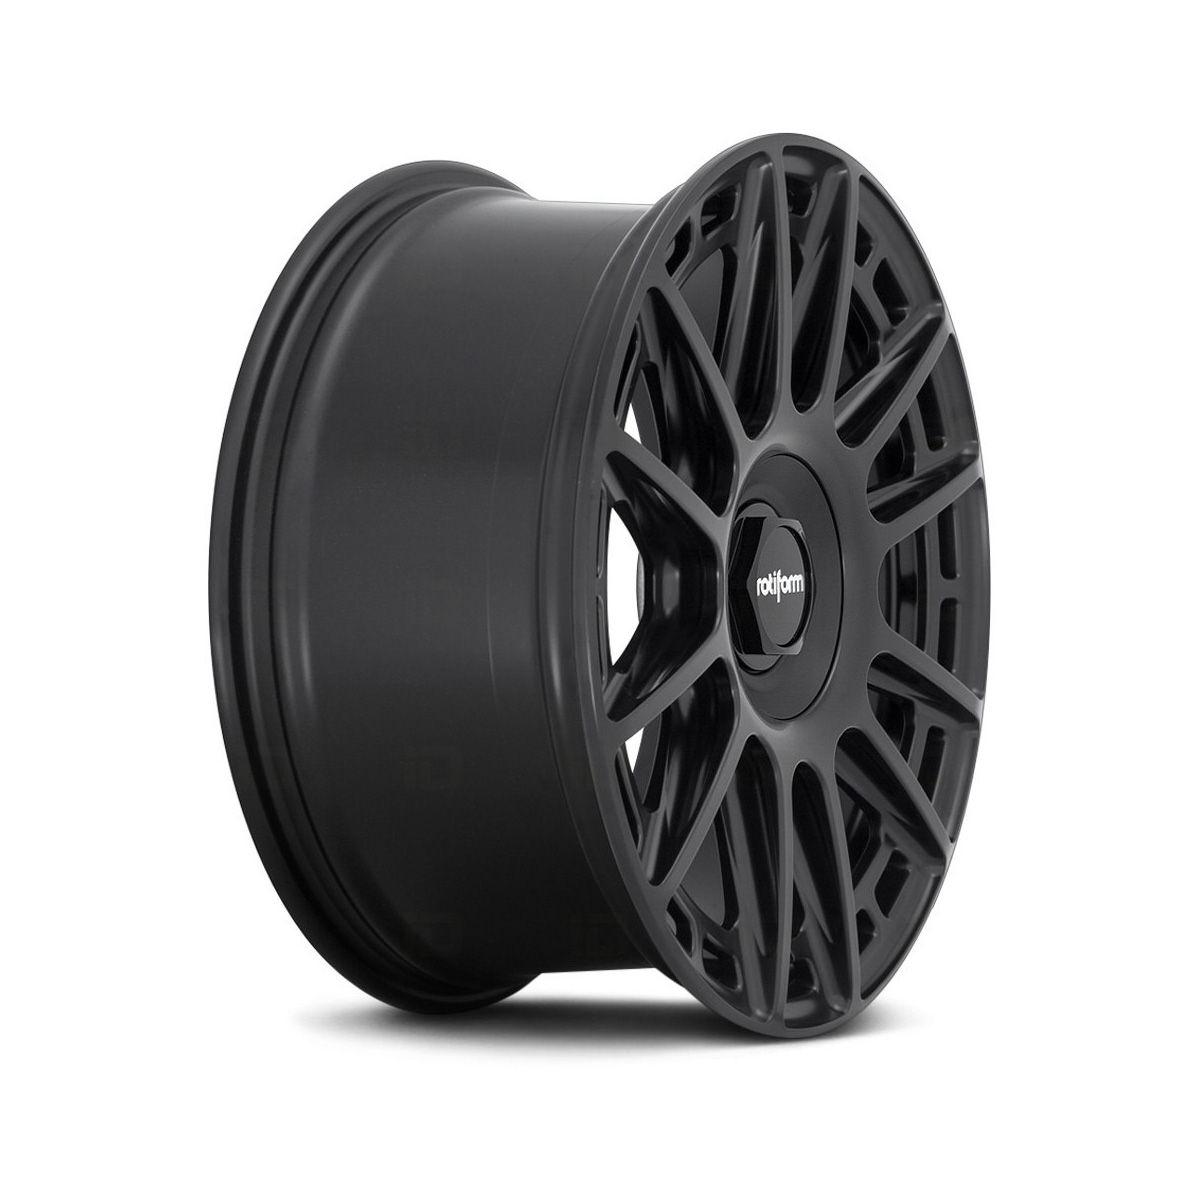 Jogo de Rodas Aro 19 Rotiform OZR BLACK